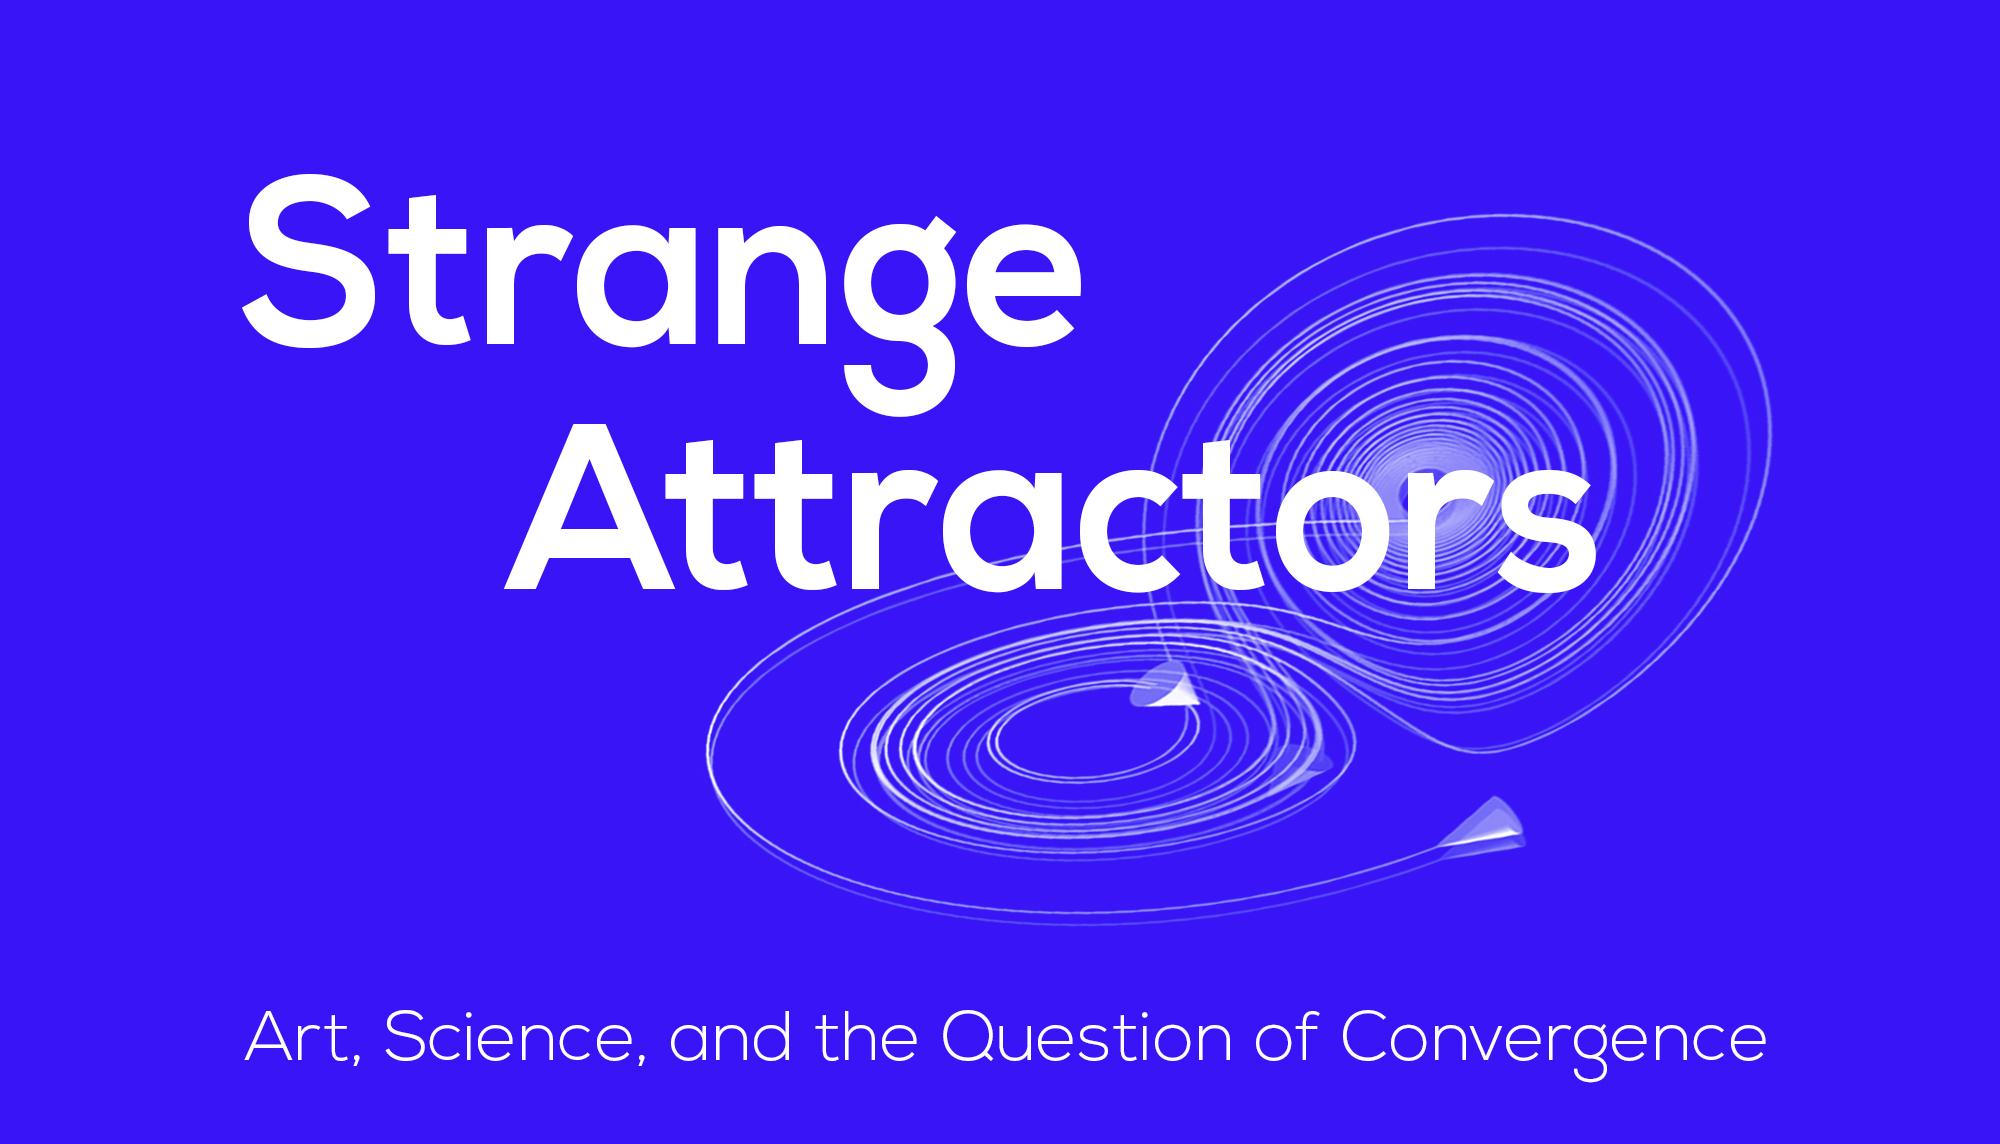 Strange_Attractors_header_Oct10.jpg